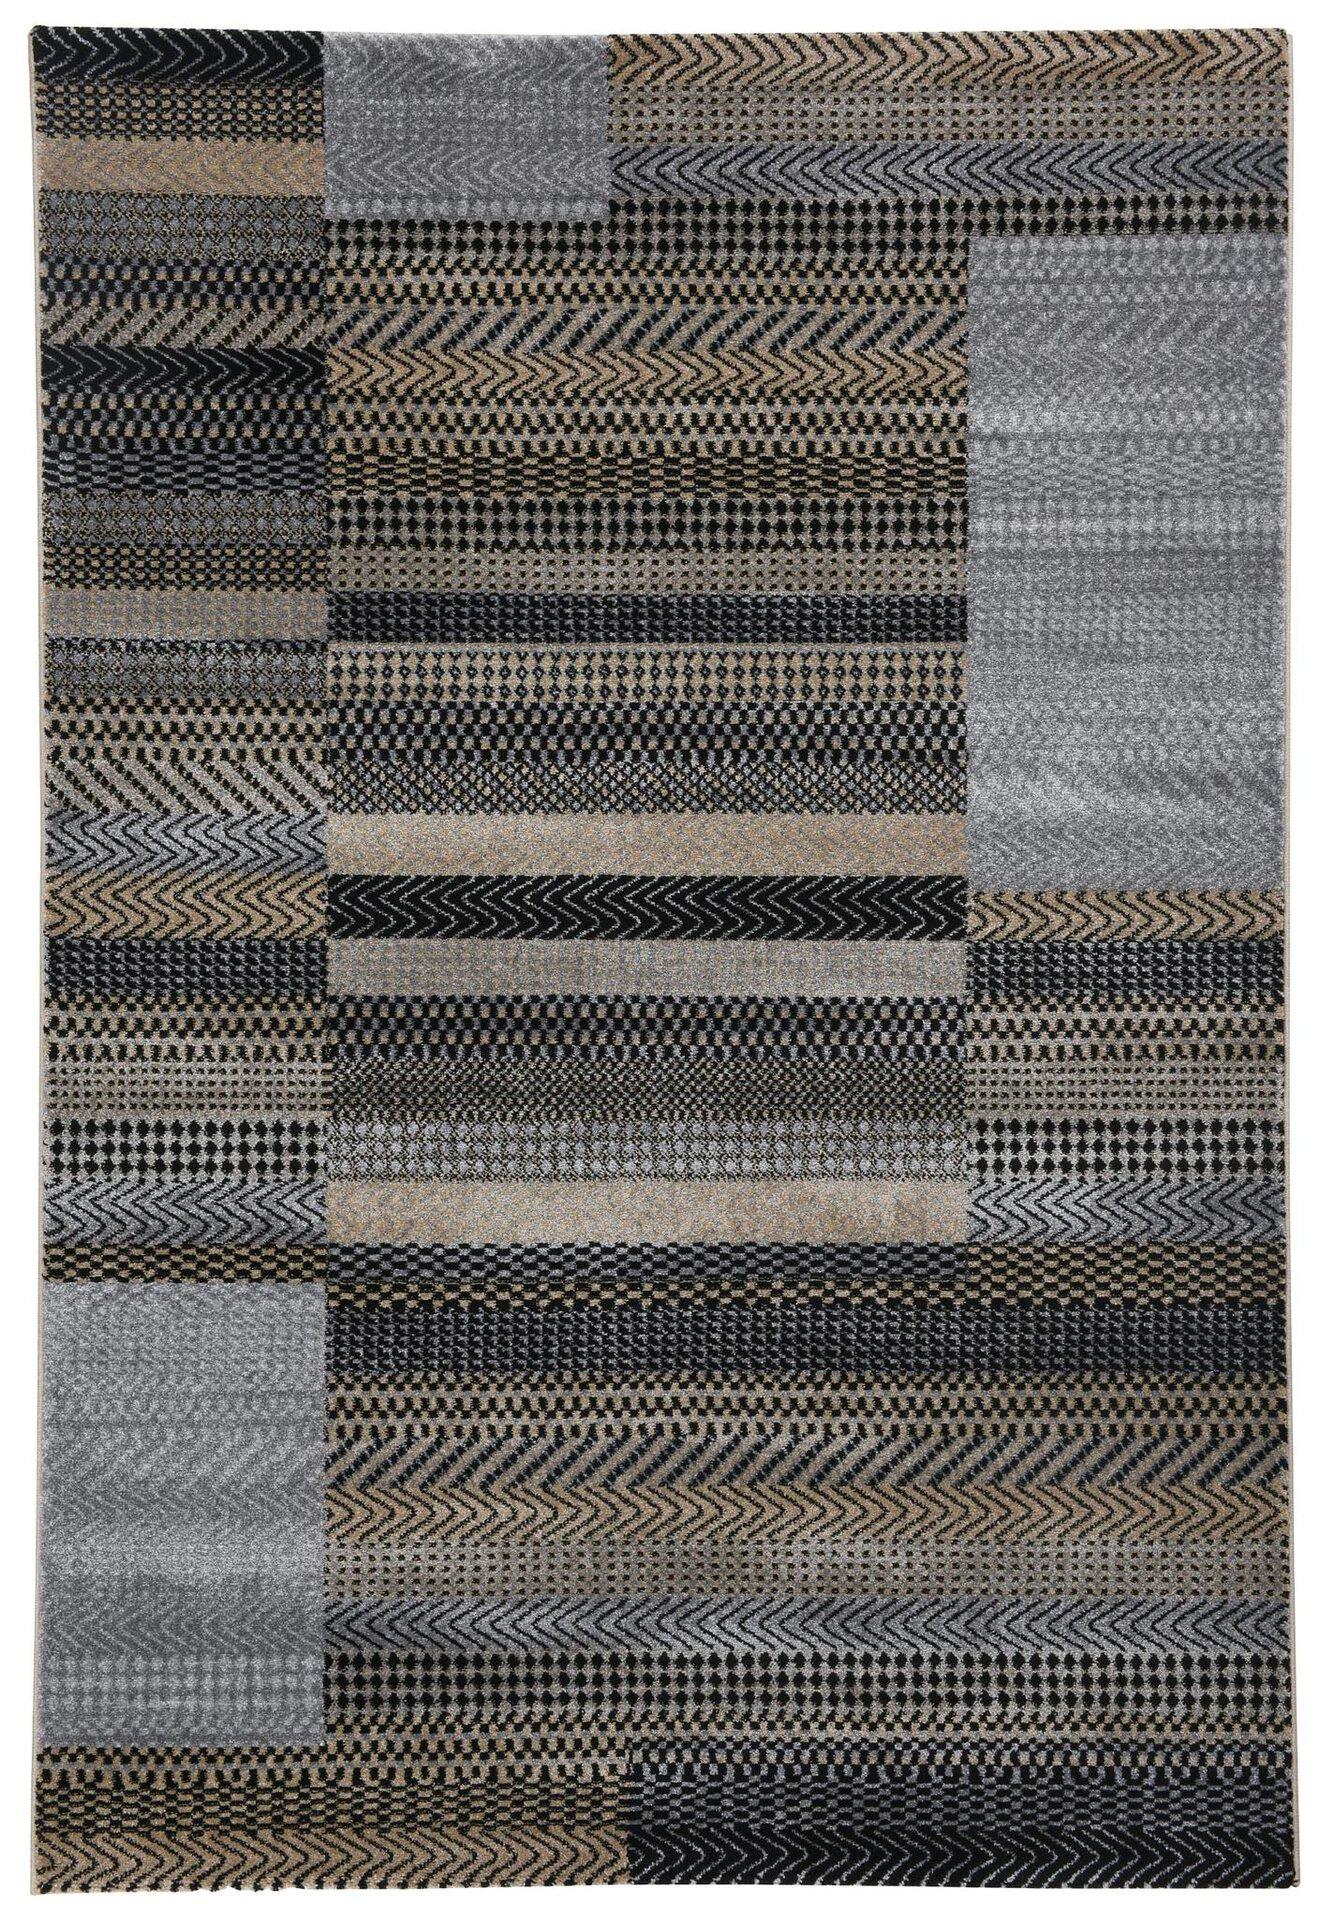 Maschinenwebteppich Monia Gino Falcone Textil grau 1 cm